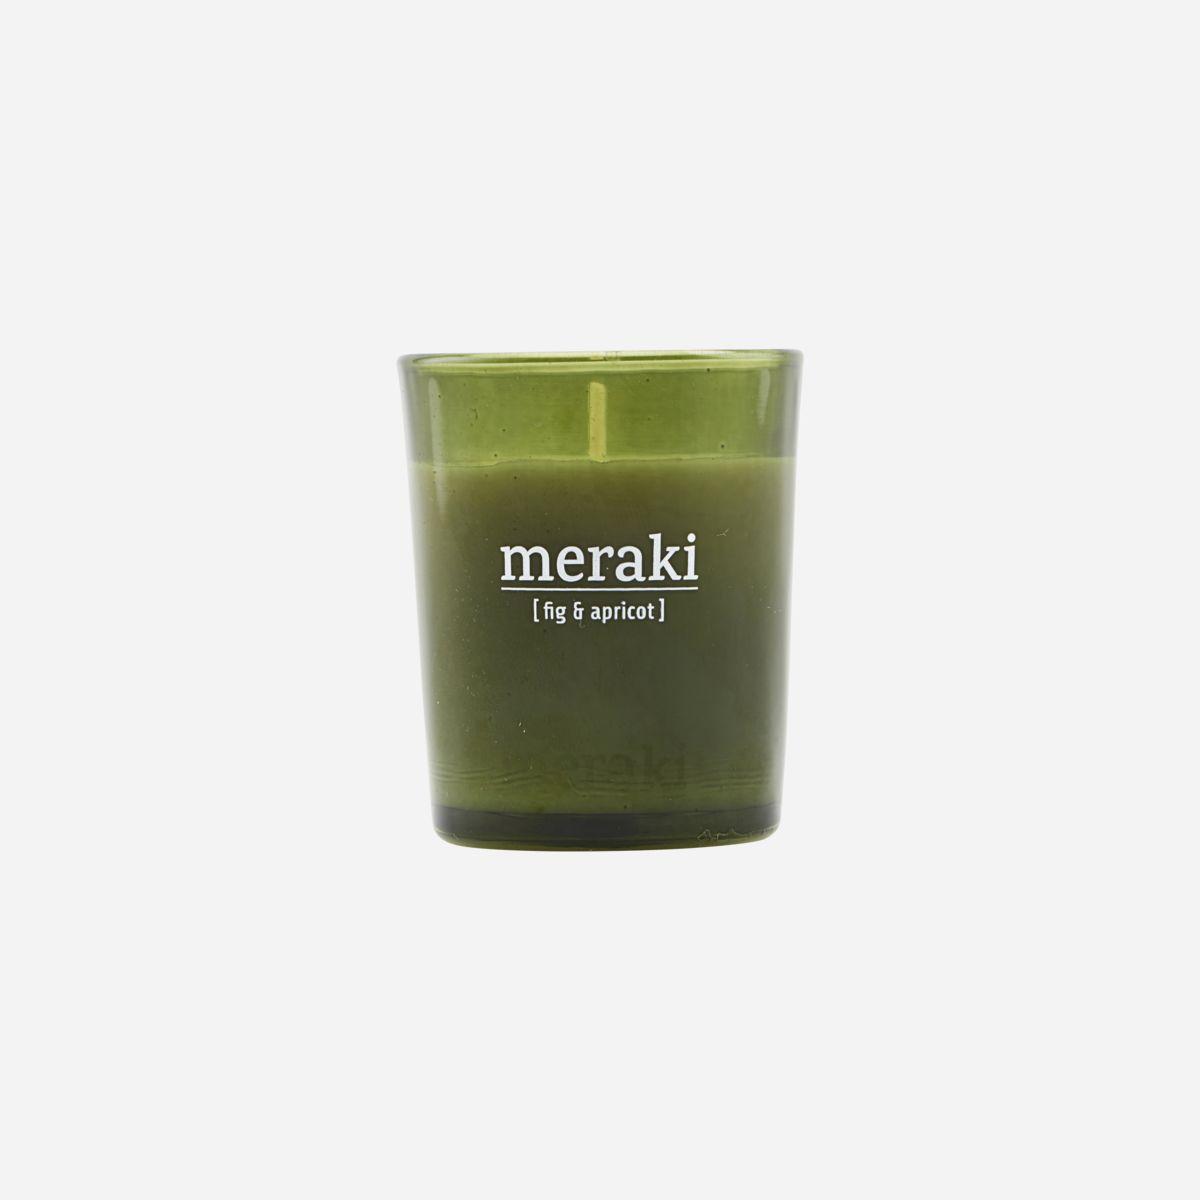 Meraki - Duftlys, fig + apricot, 60g